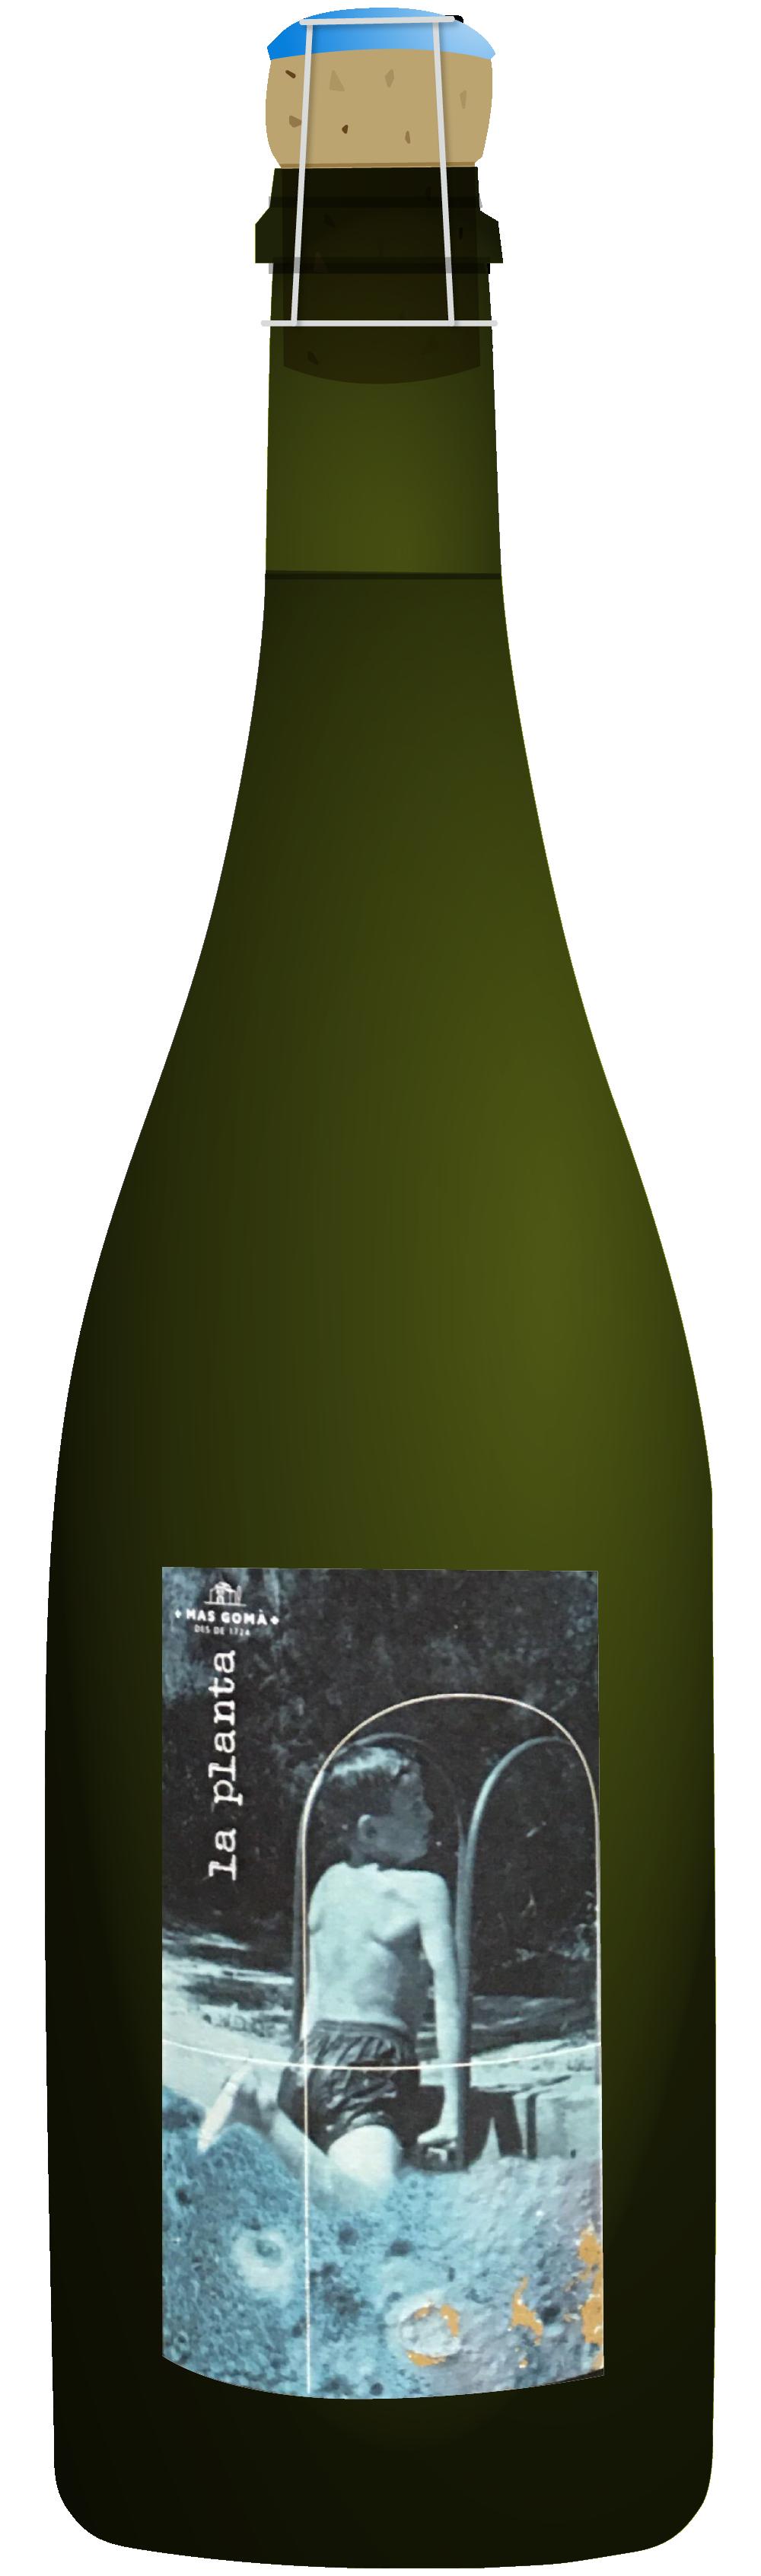 the natural wine company club august 2021 spain mas goma la planta